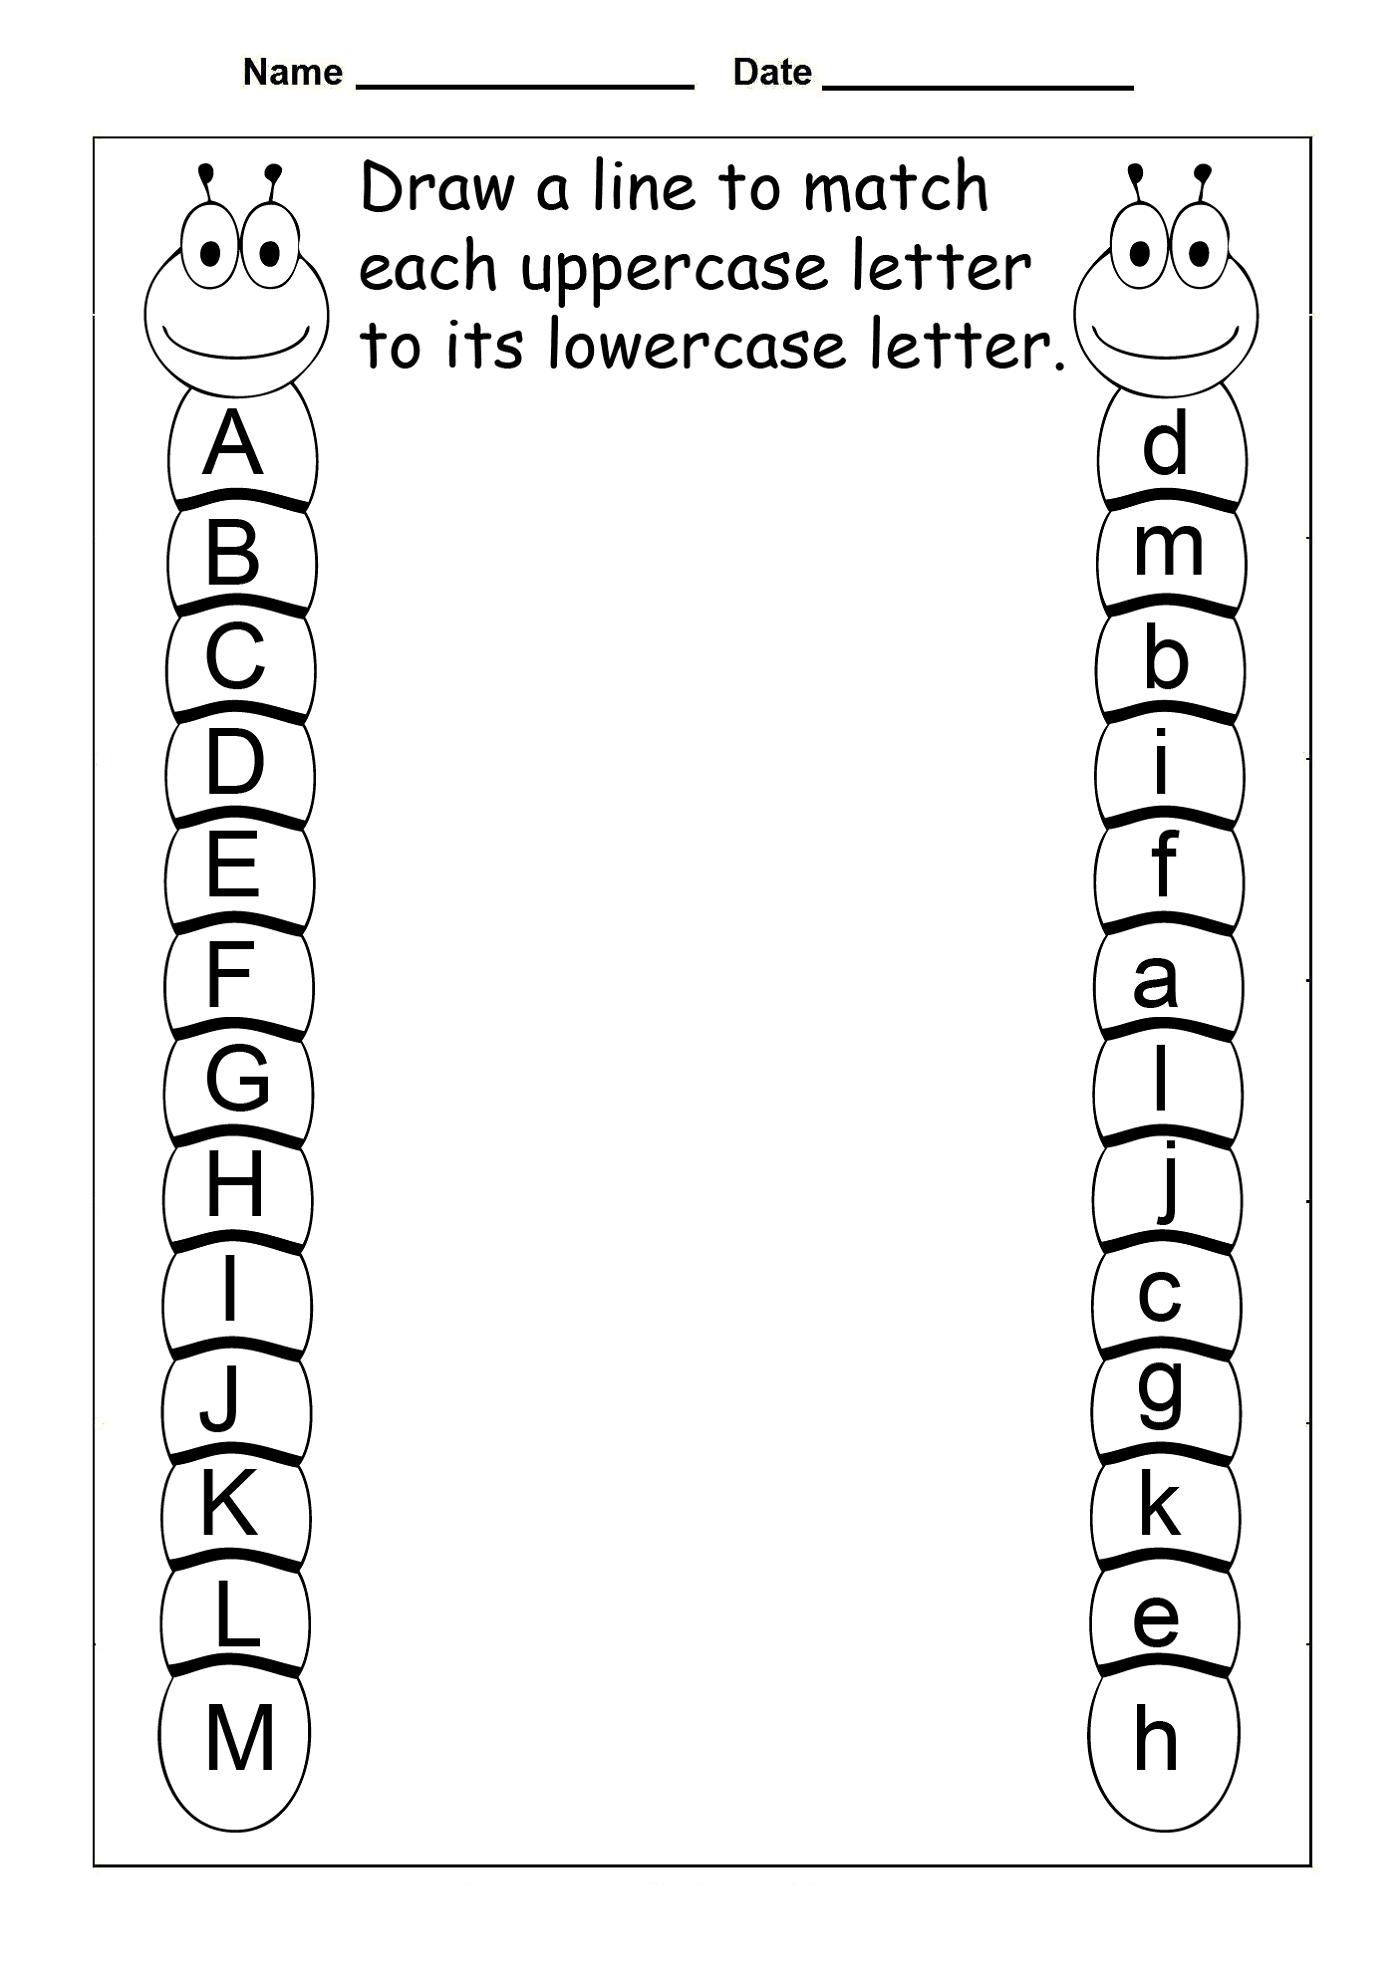 Preschool Worksheets Free Uppercase And Lowercase Letters | Learning | Vpk Printable Worksheets